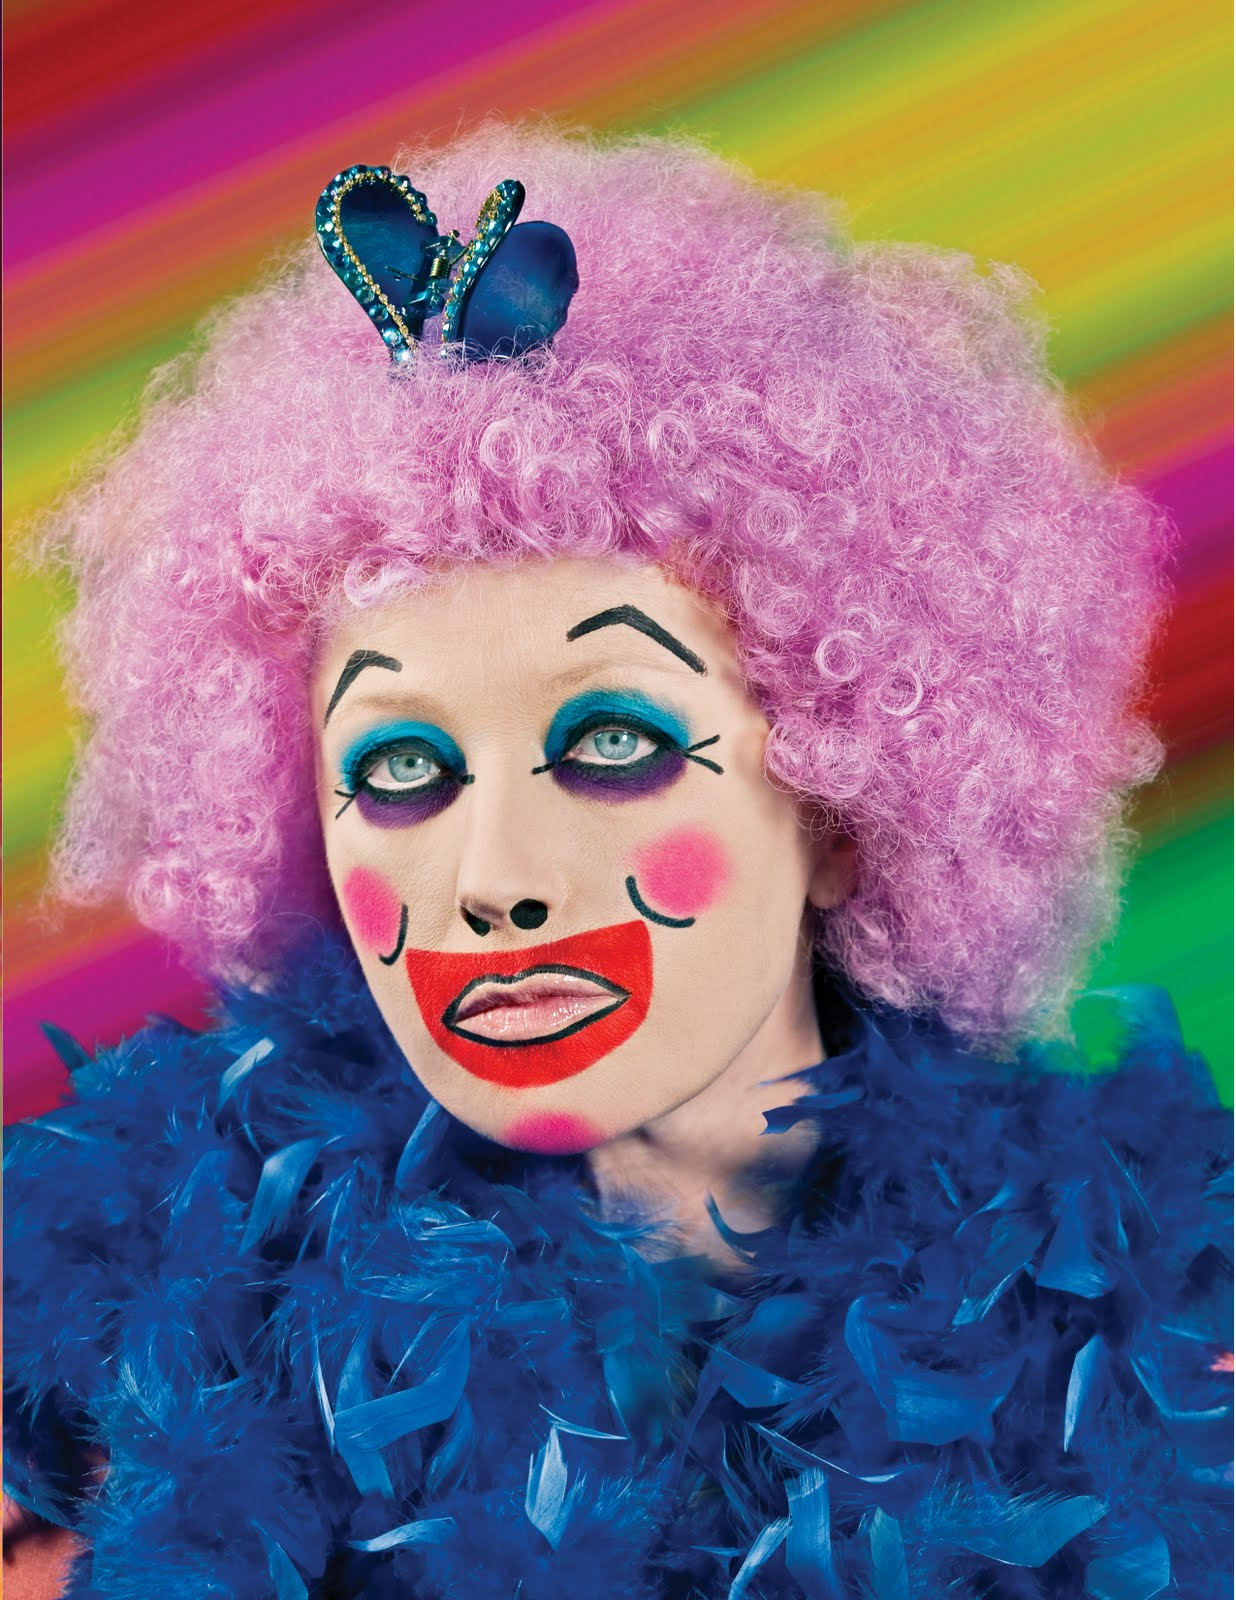 Cindy Sherman | REF: maliphotographyreferences.wordpress.com/category/photography-1/3...